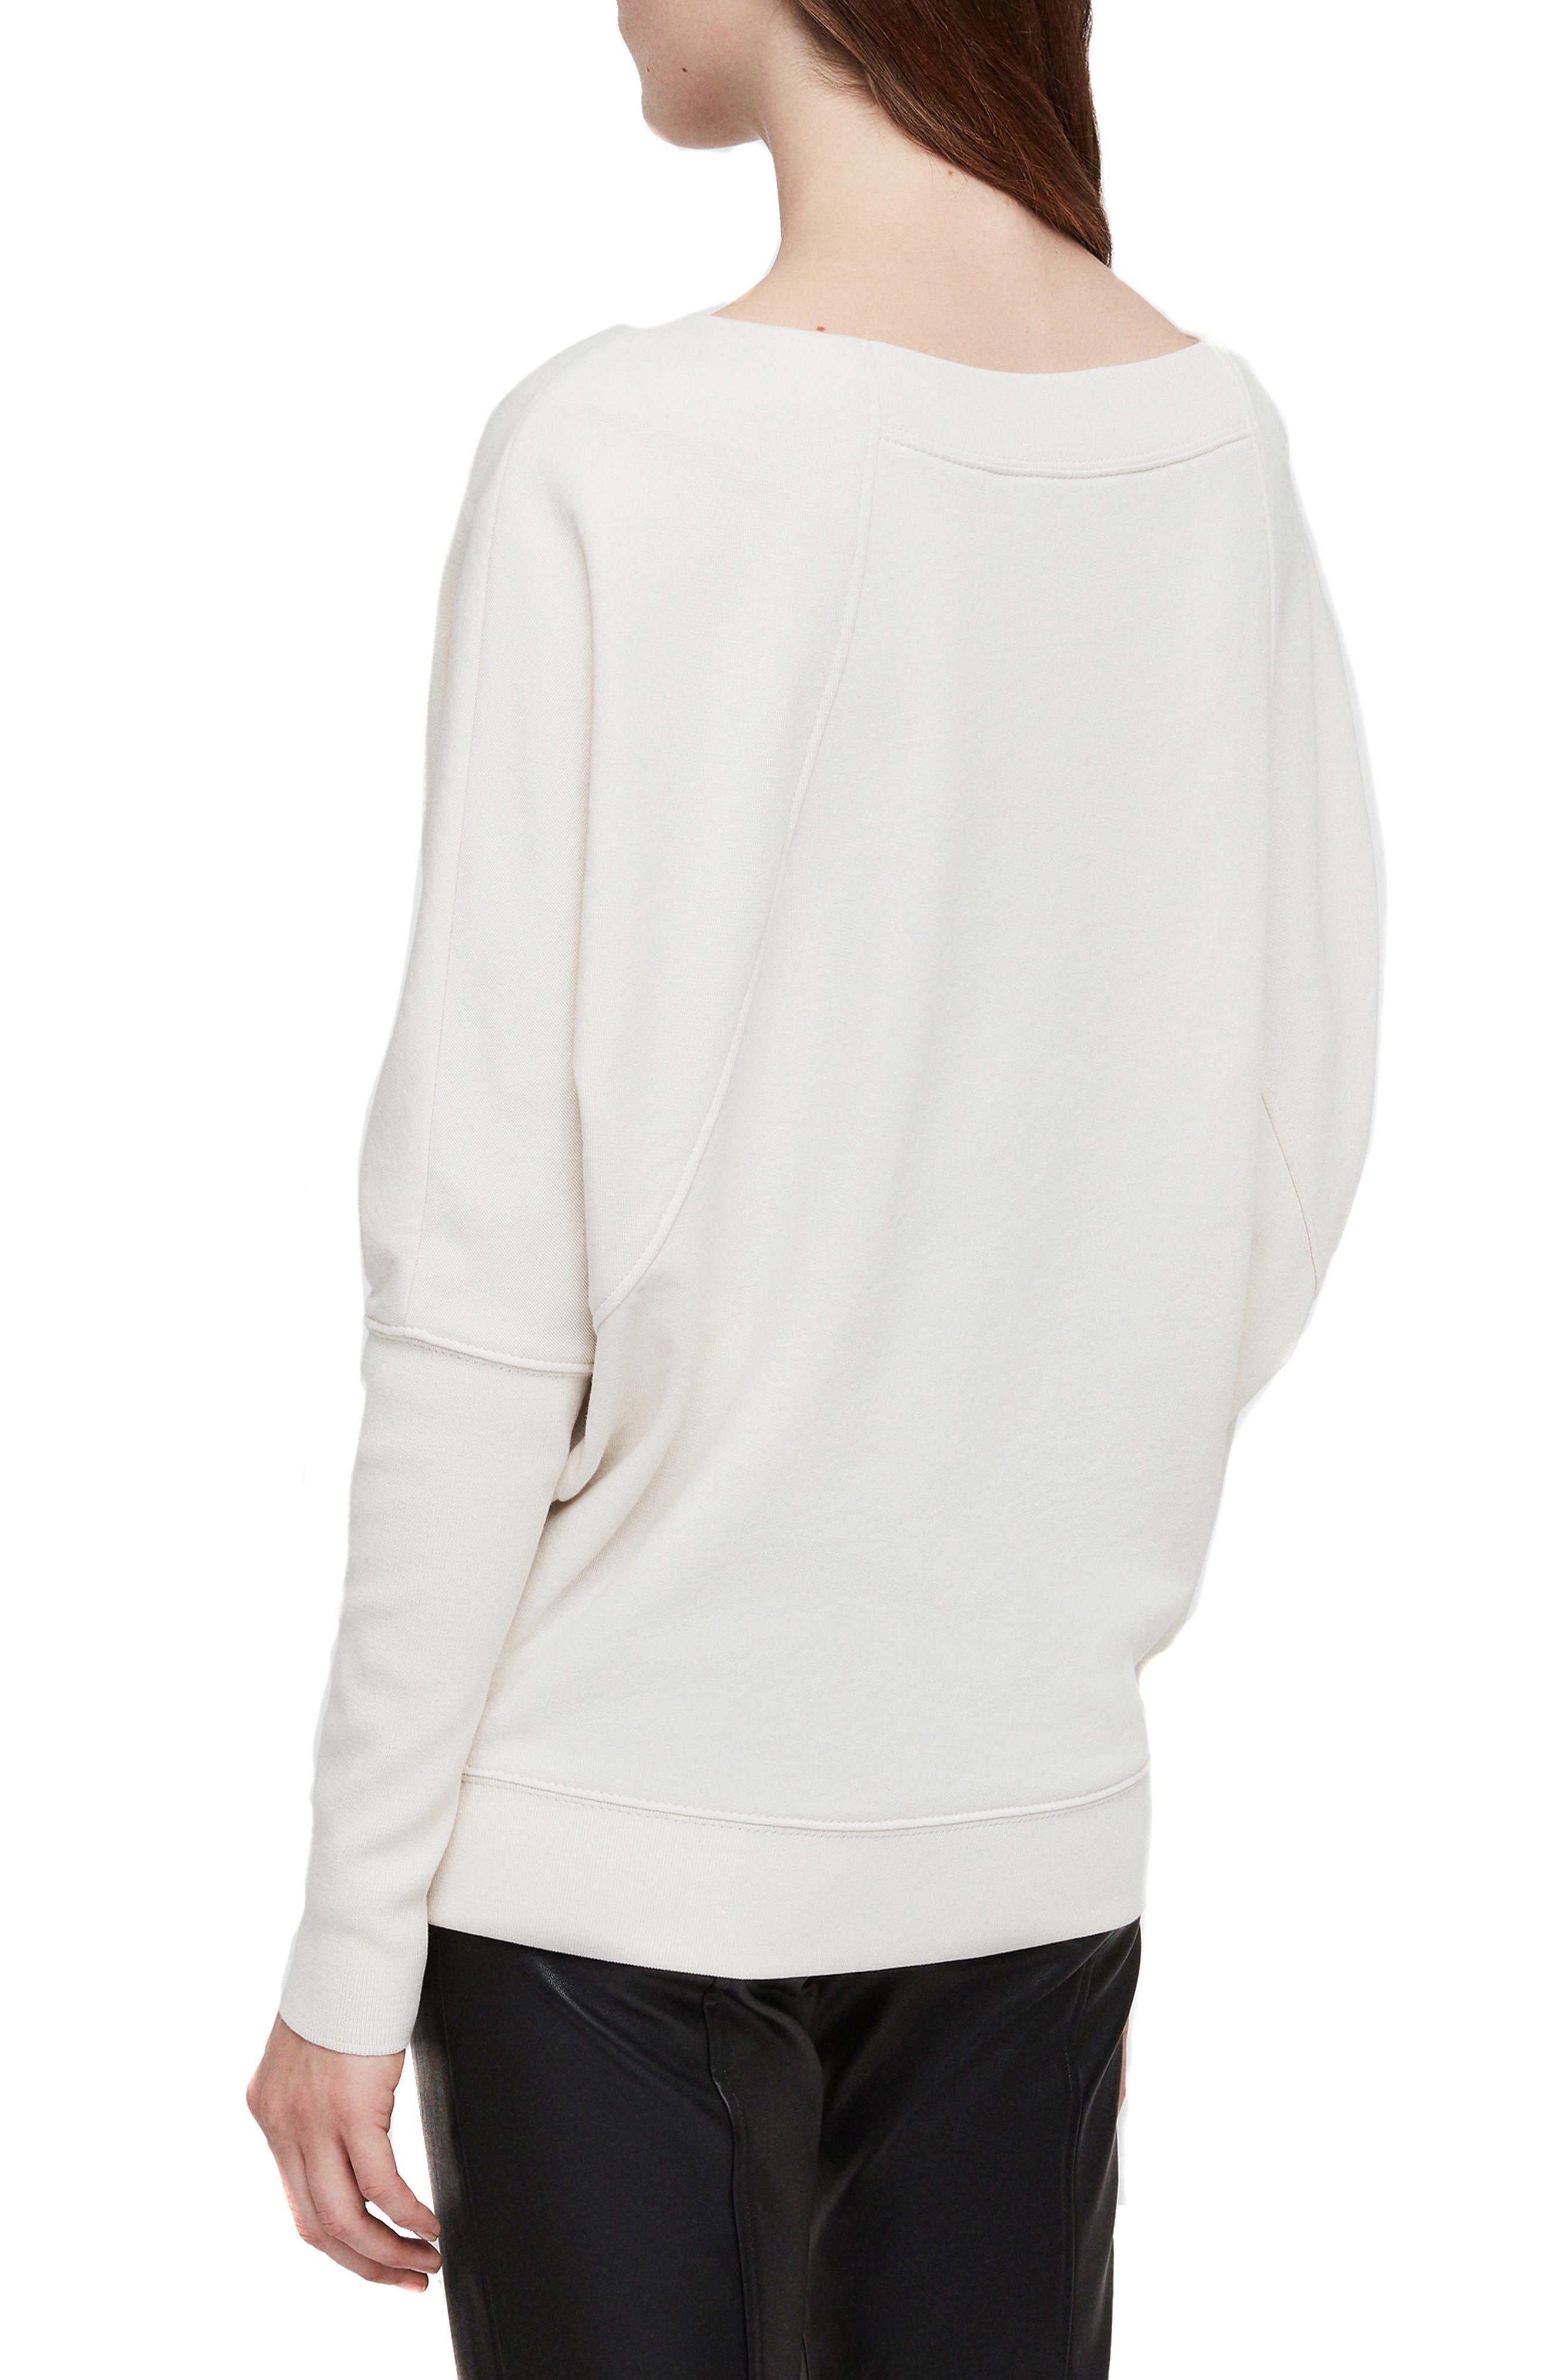 Allsaints Ridley One Shoulder Sweatshirt Nordstrom